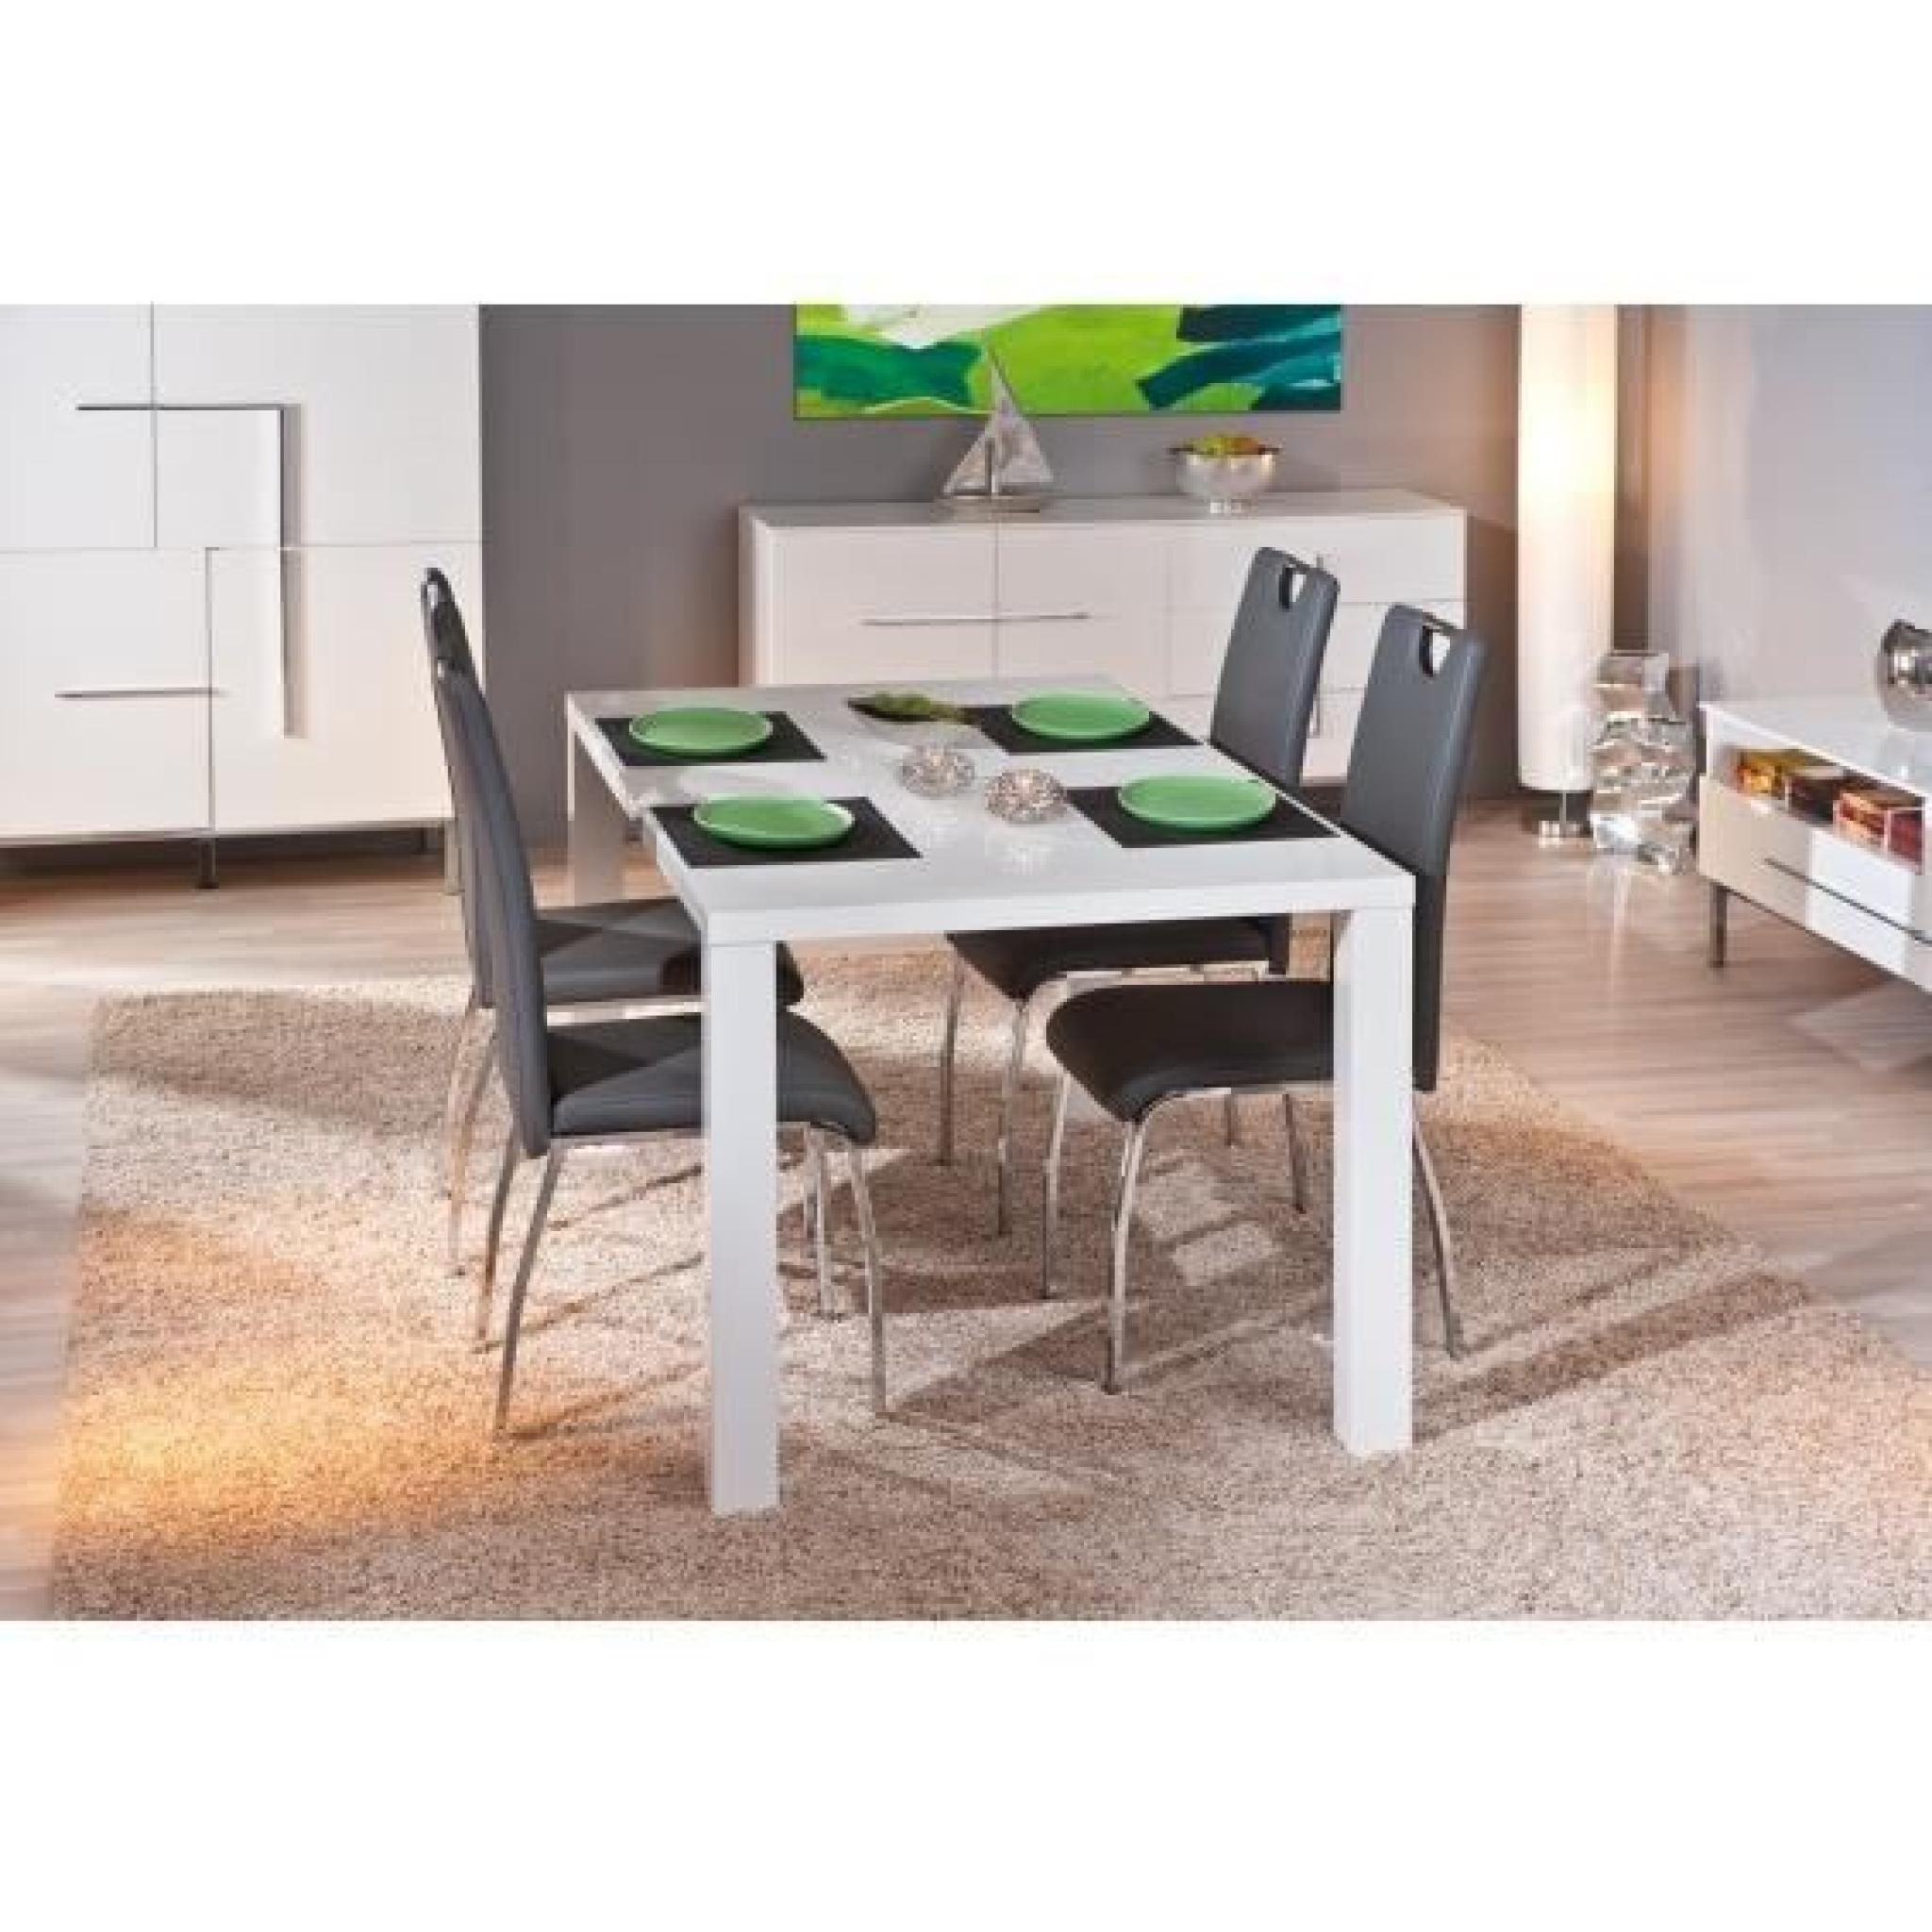 irma table 4 pieds avec allonge achat vente table. Black Bedroom Furniture Sets. Home Design Ideas